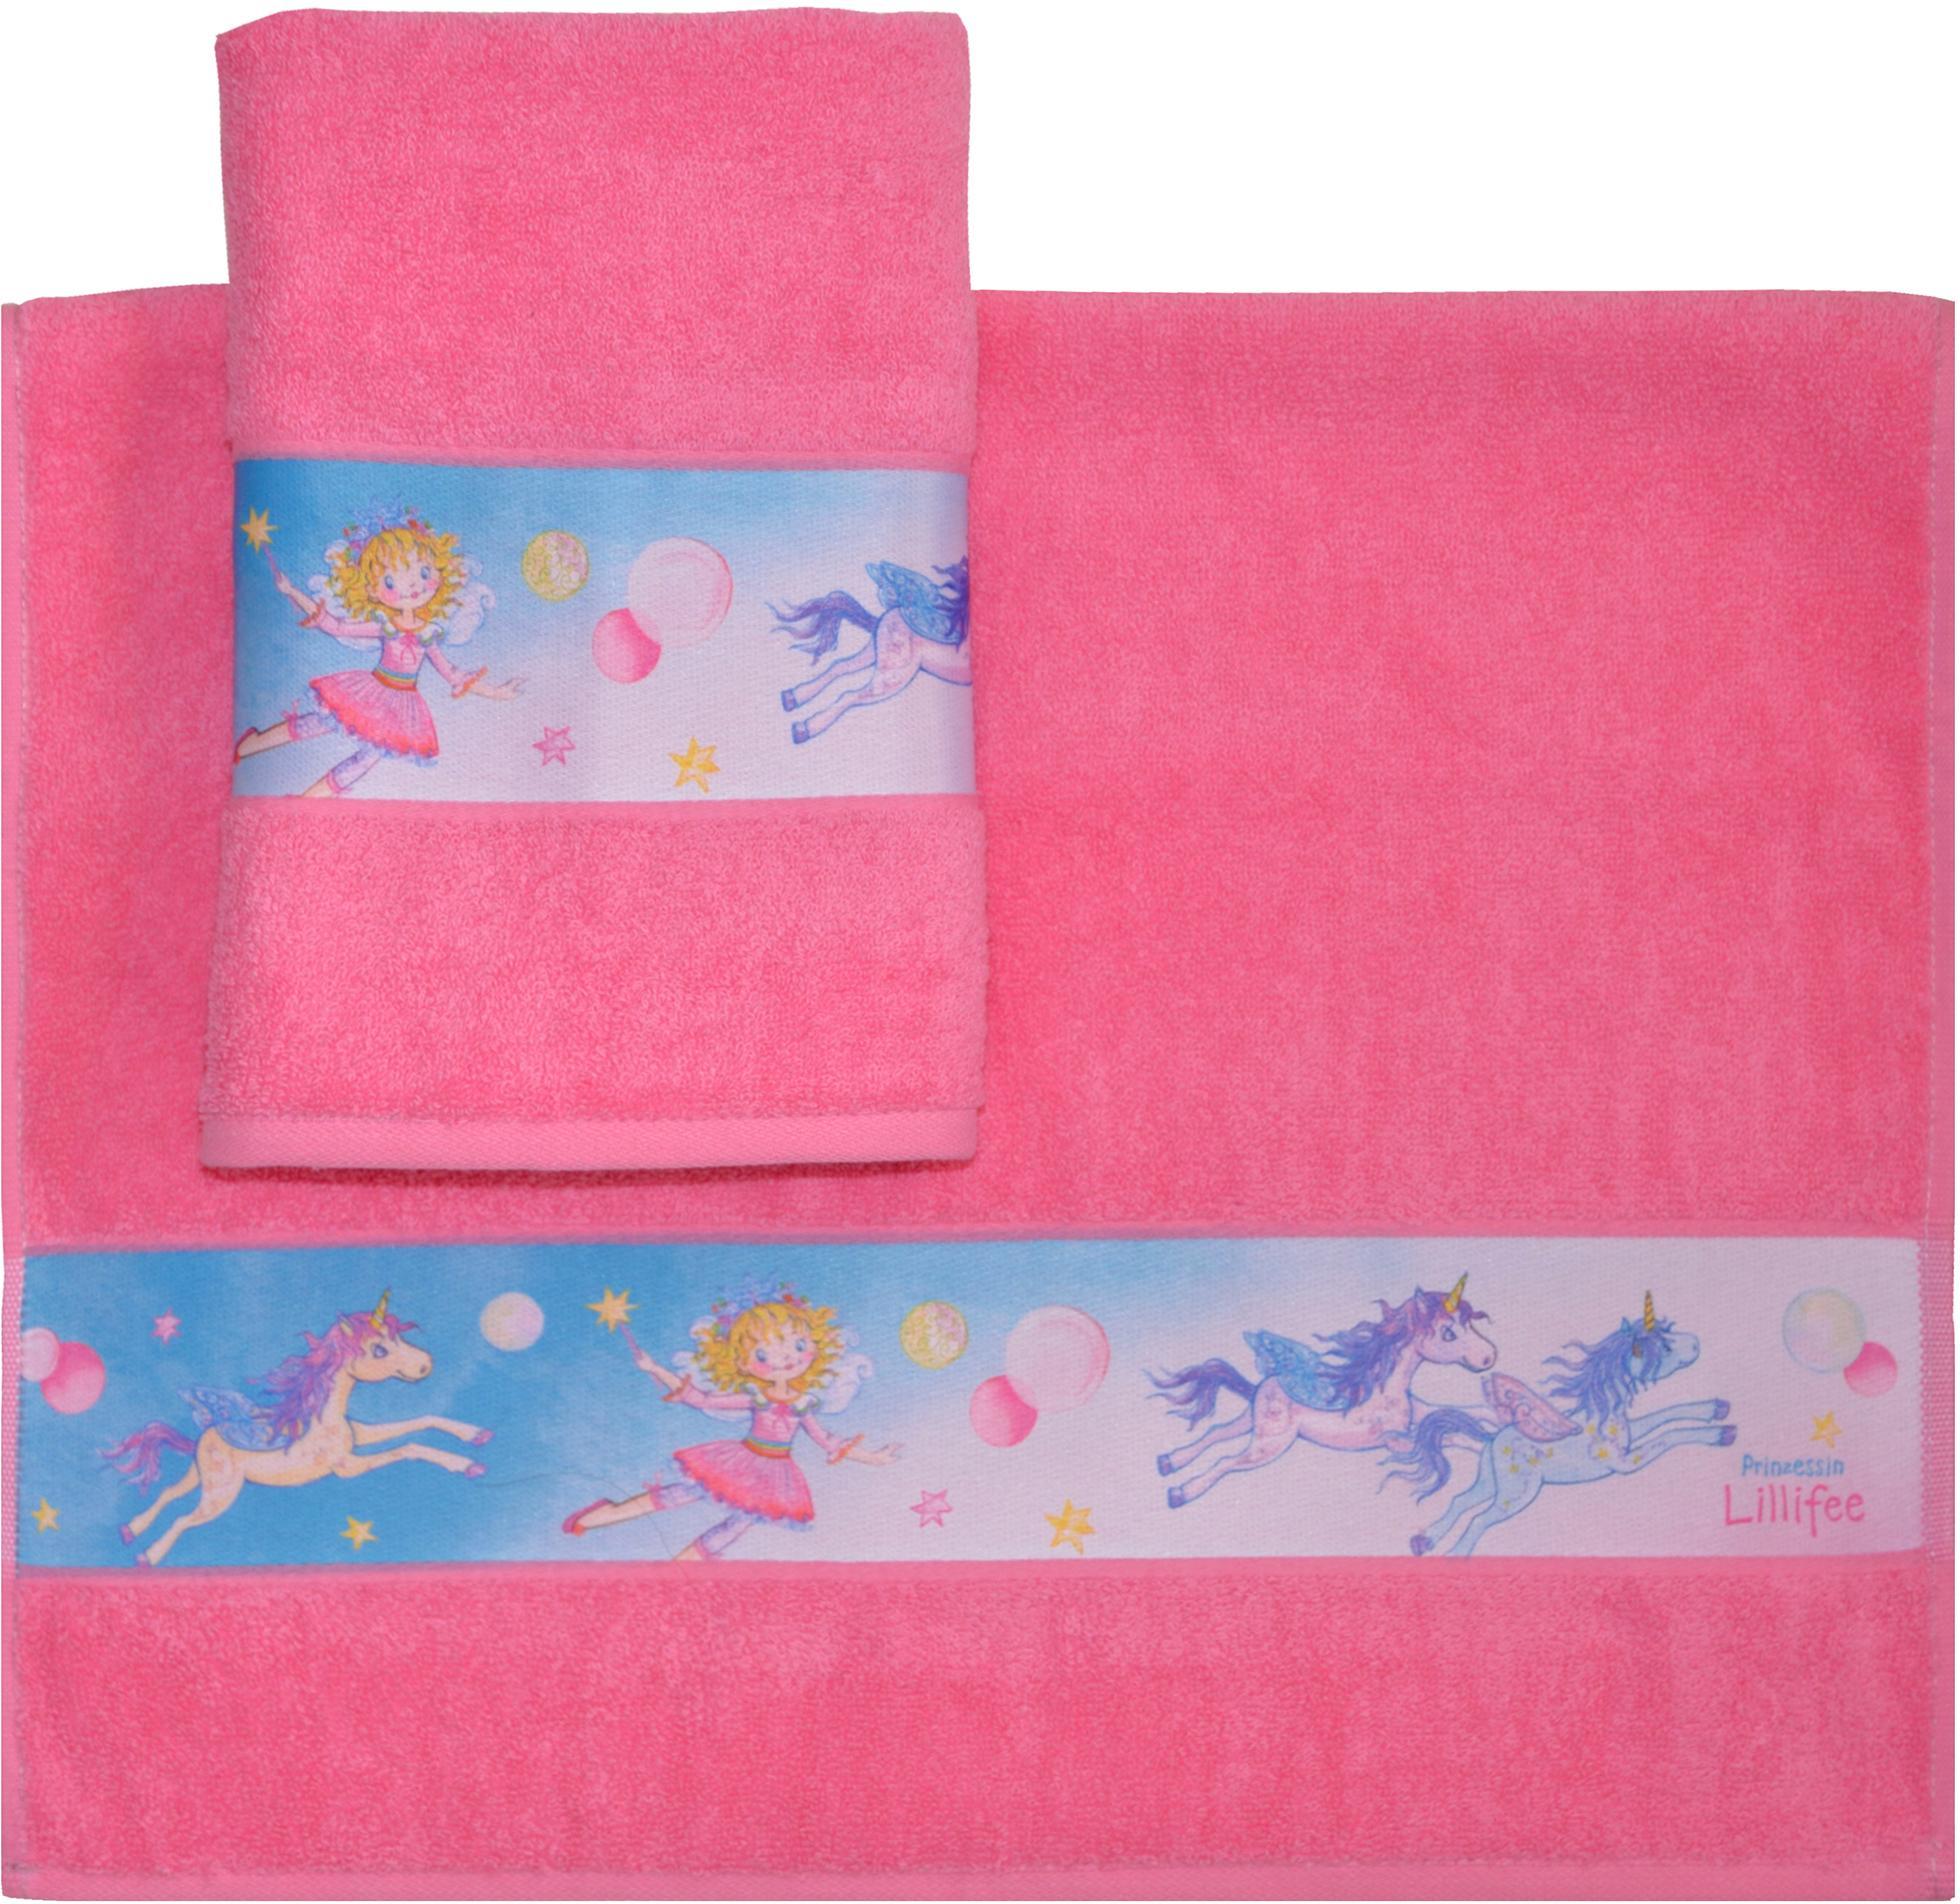 Handtücher ´´Lillifee´´ Prinzessin Lillifee